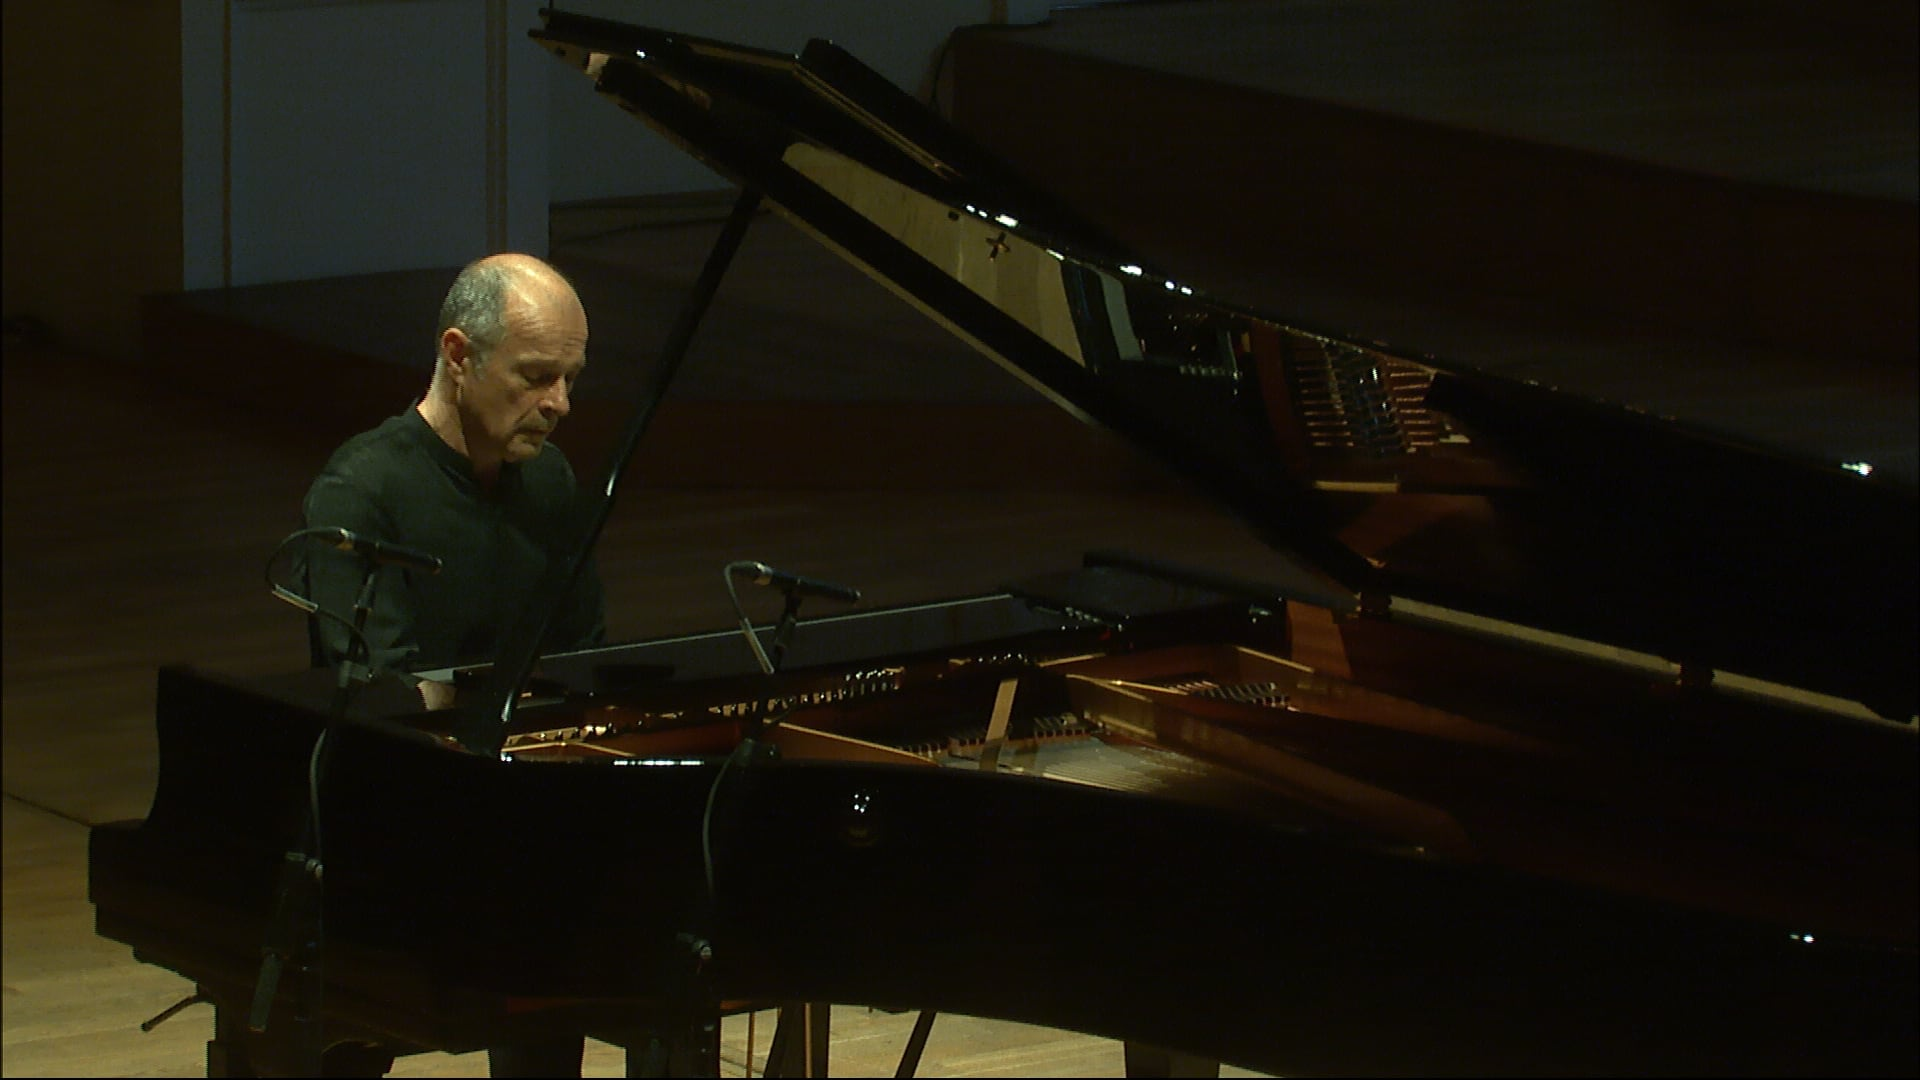 Koncert bez publika VII / Miki Skuta